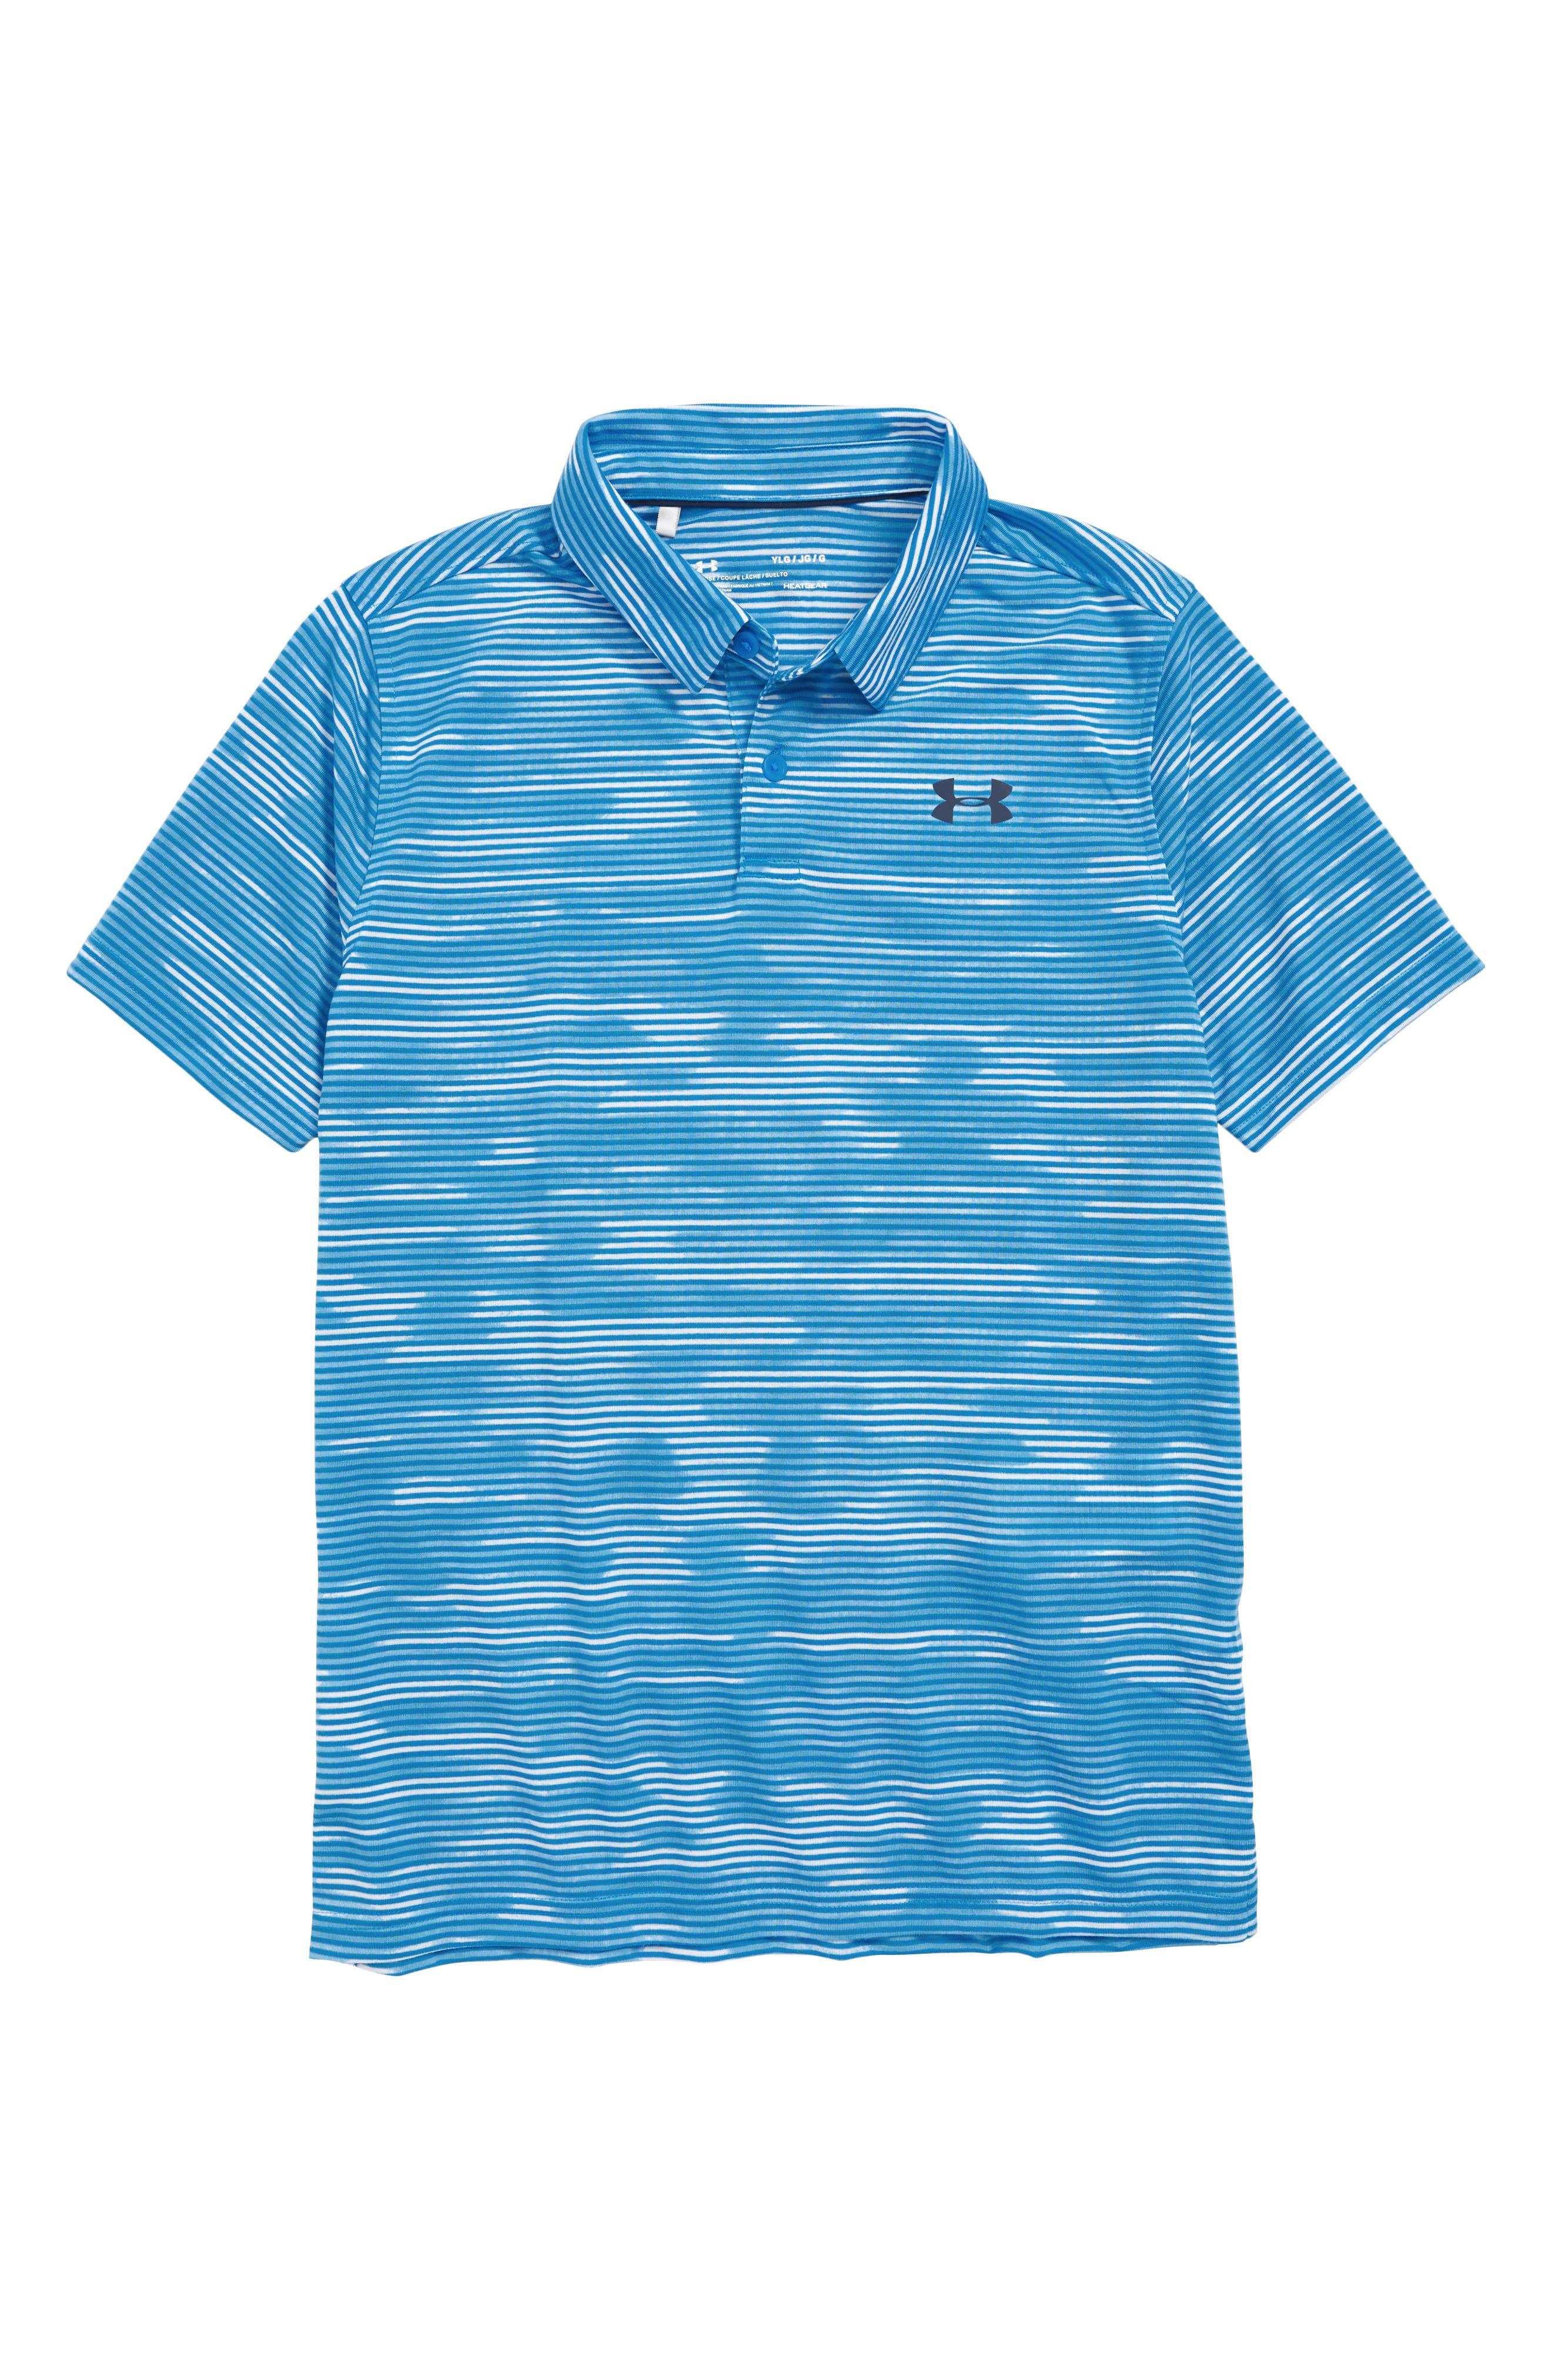 Threadborne Polo,                             Main thumbnail 1, color,                             BLUE CIRCUIT